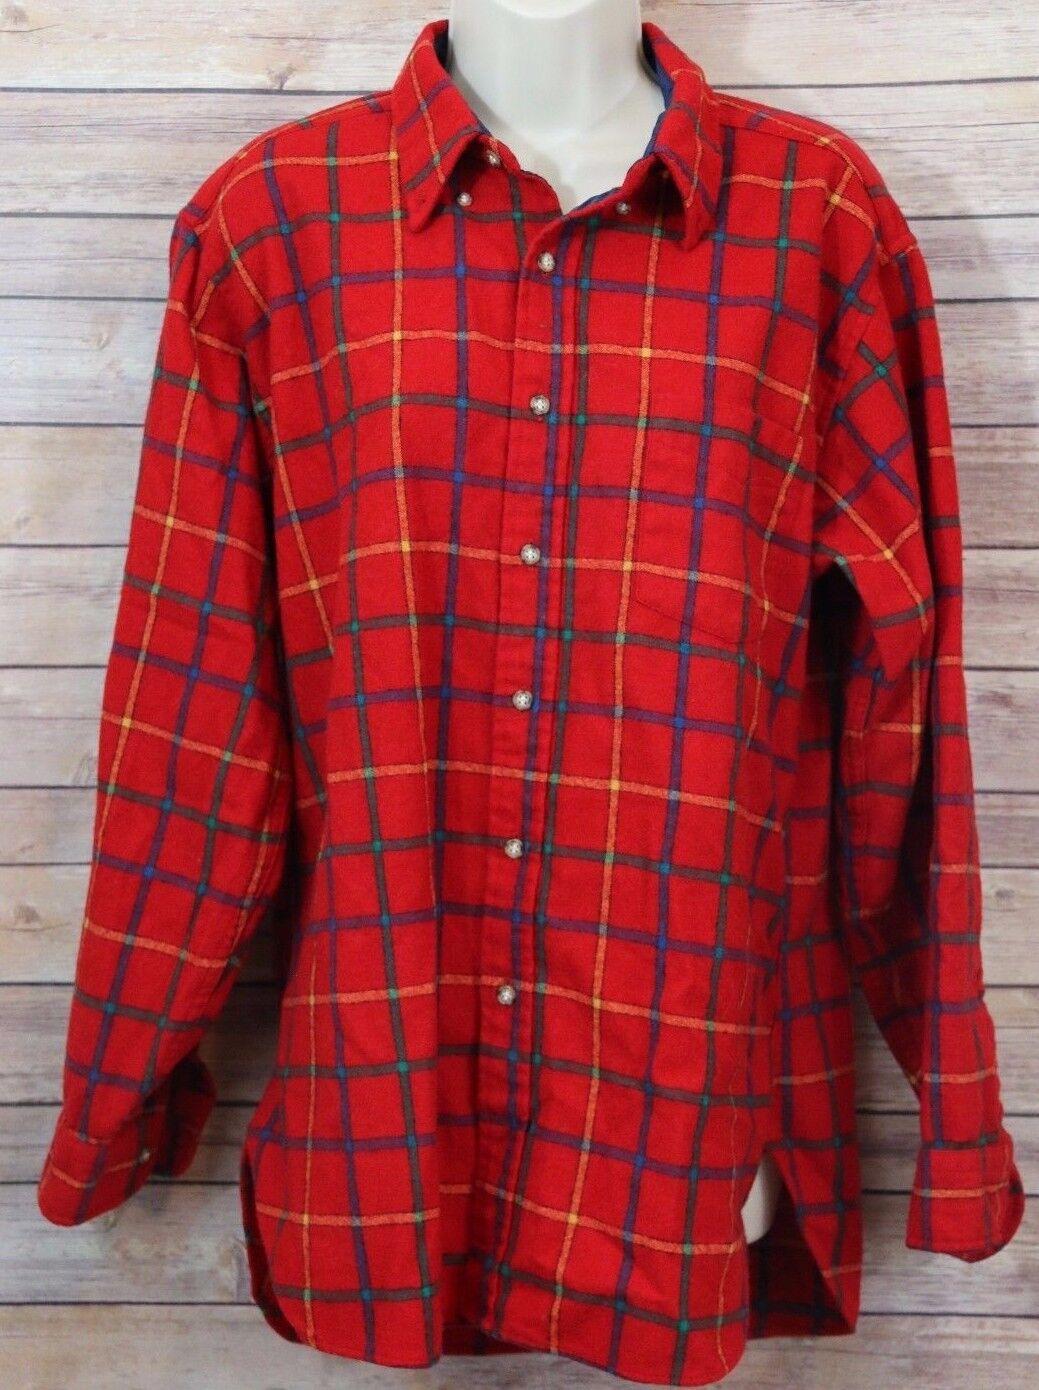 VTG Pendleton Virgin Wool Board Shirt Red Flannel Plaid 70s Size Large